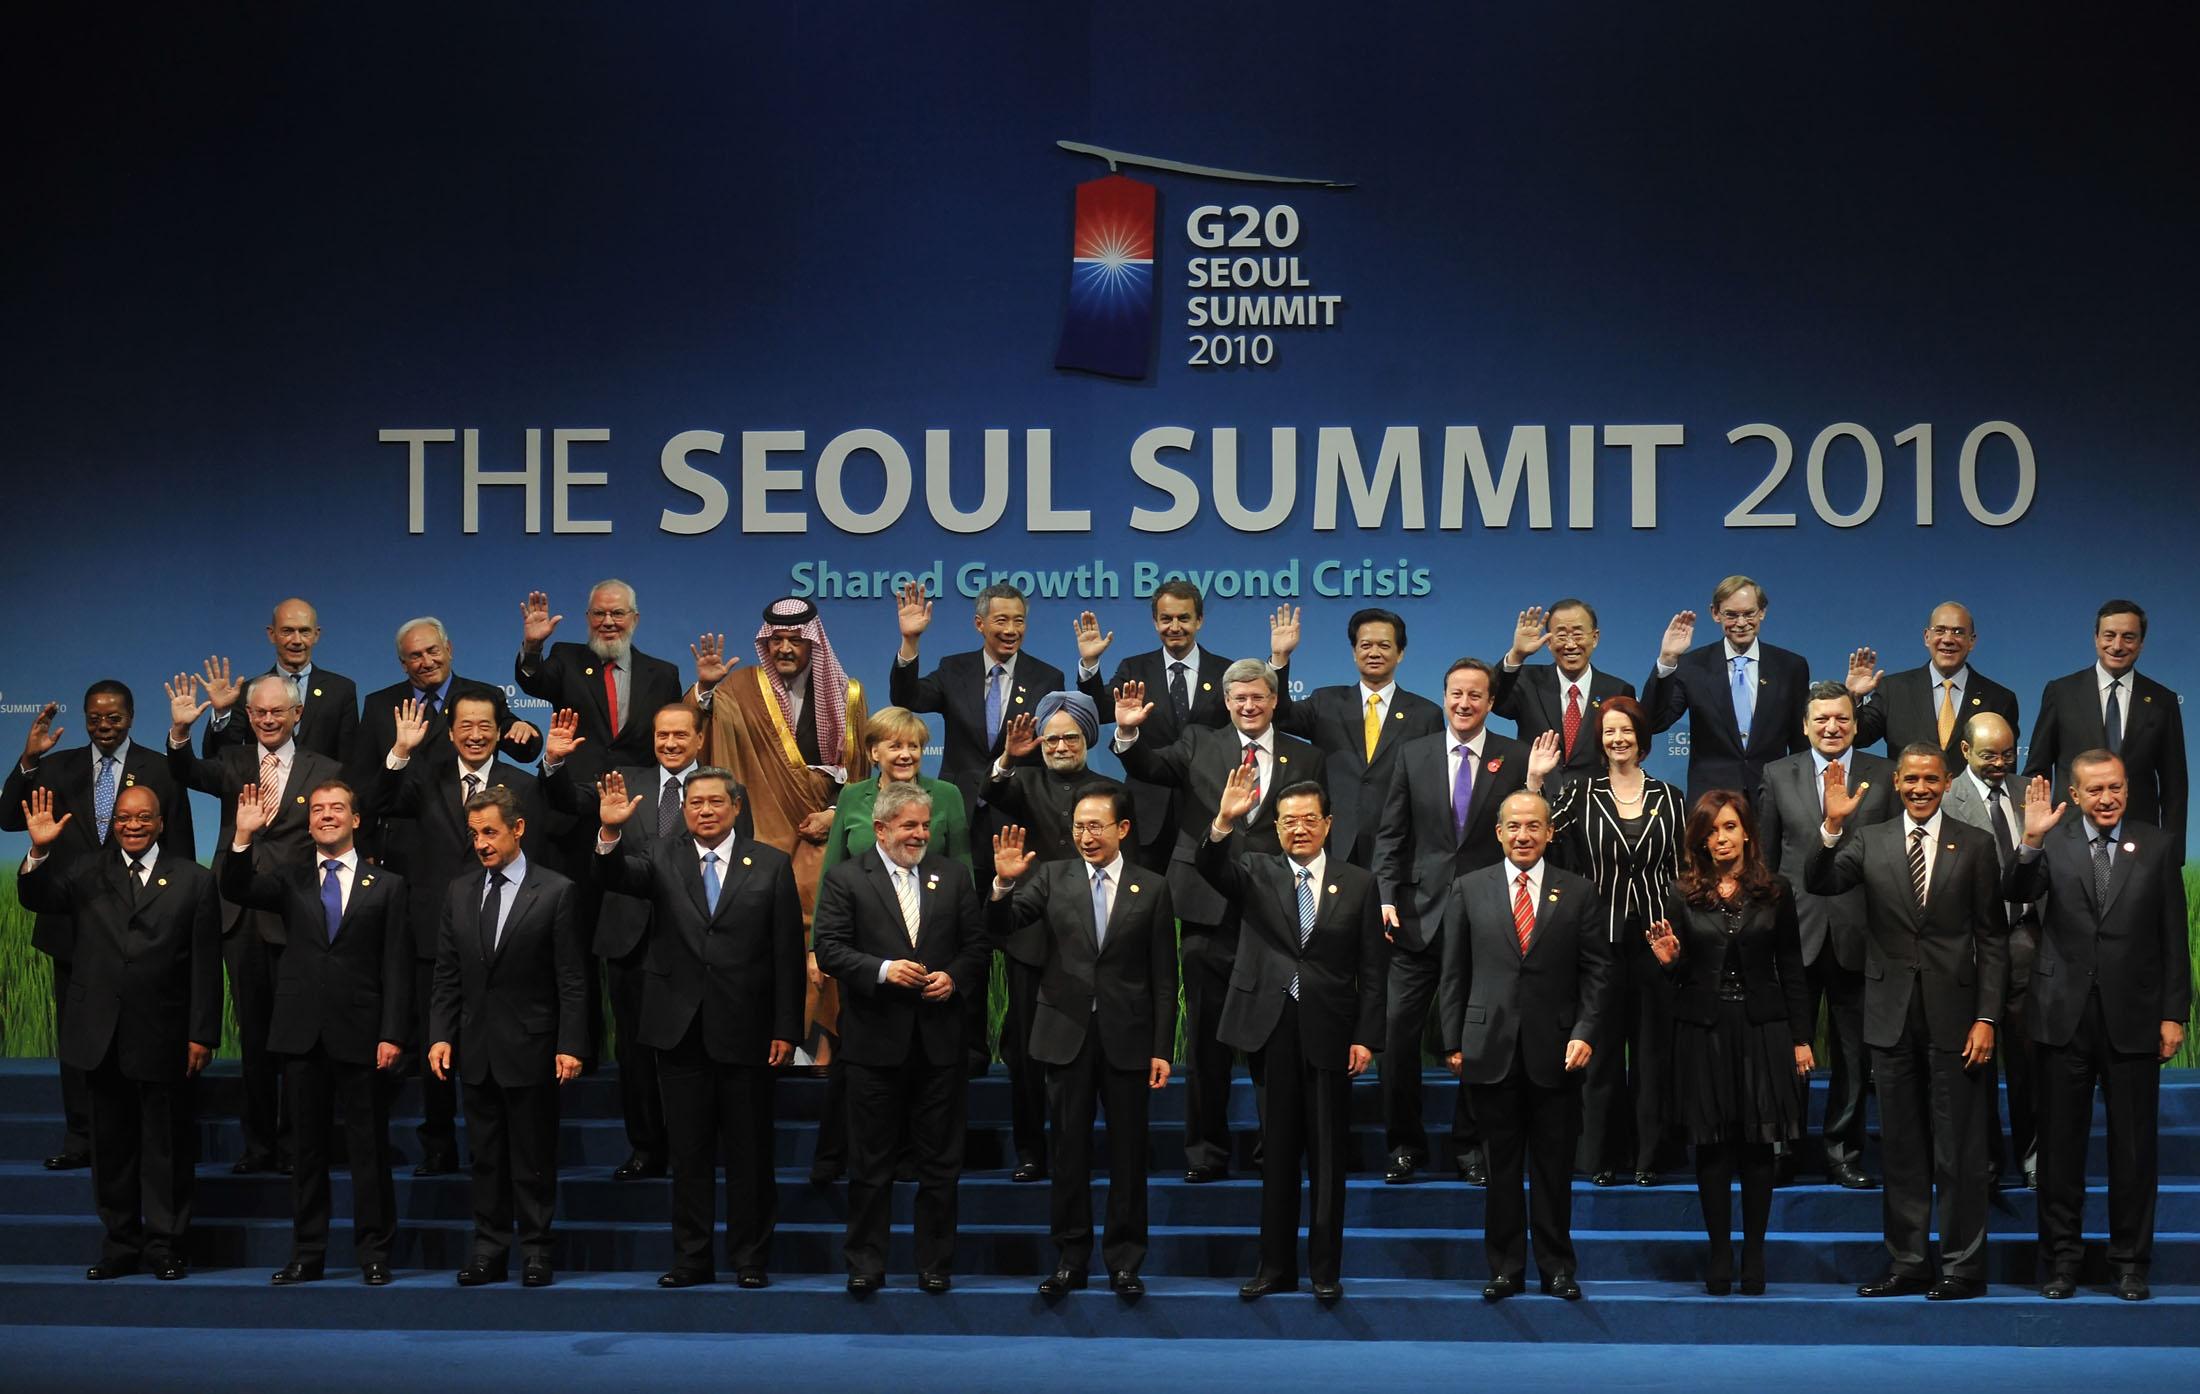 http://upload.wikimedia.org/wikipedia/commons/c/c5/2010_G-20_Seoul_summit.jpg